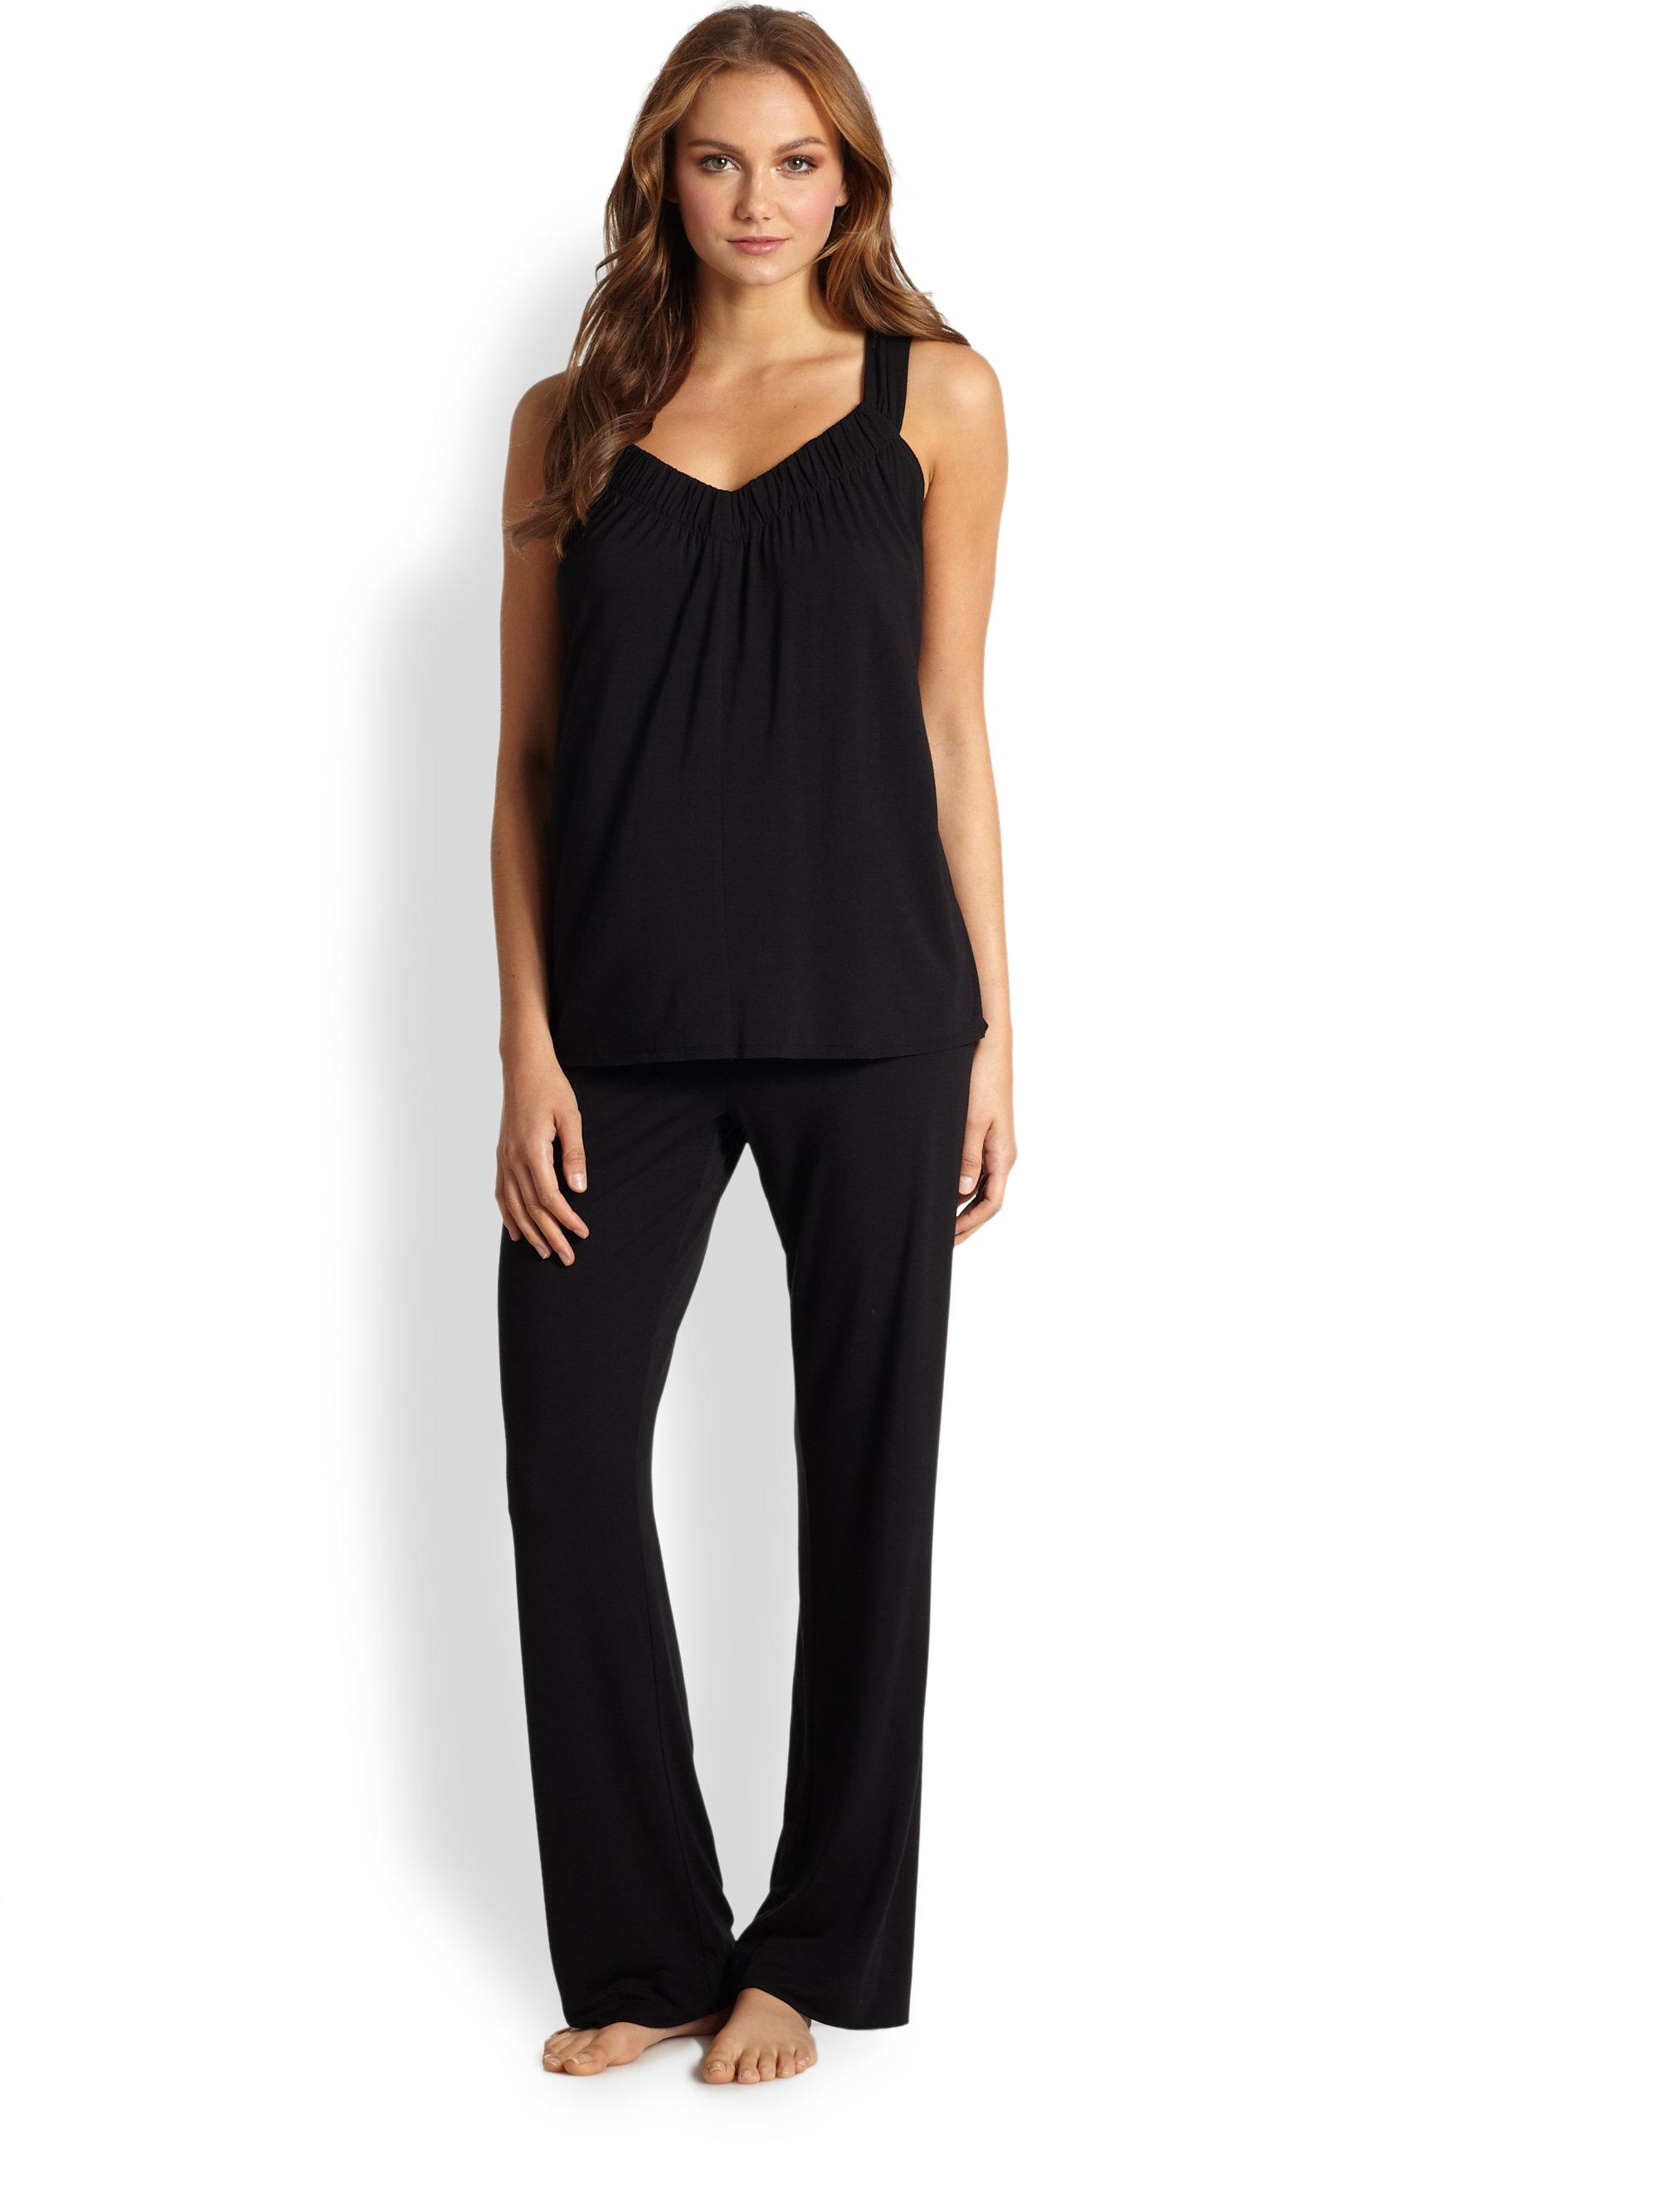 Donna karan new york sleeveless liquid jersey pajama set for Donna karan new york